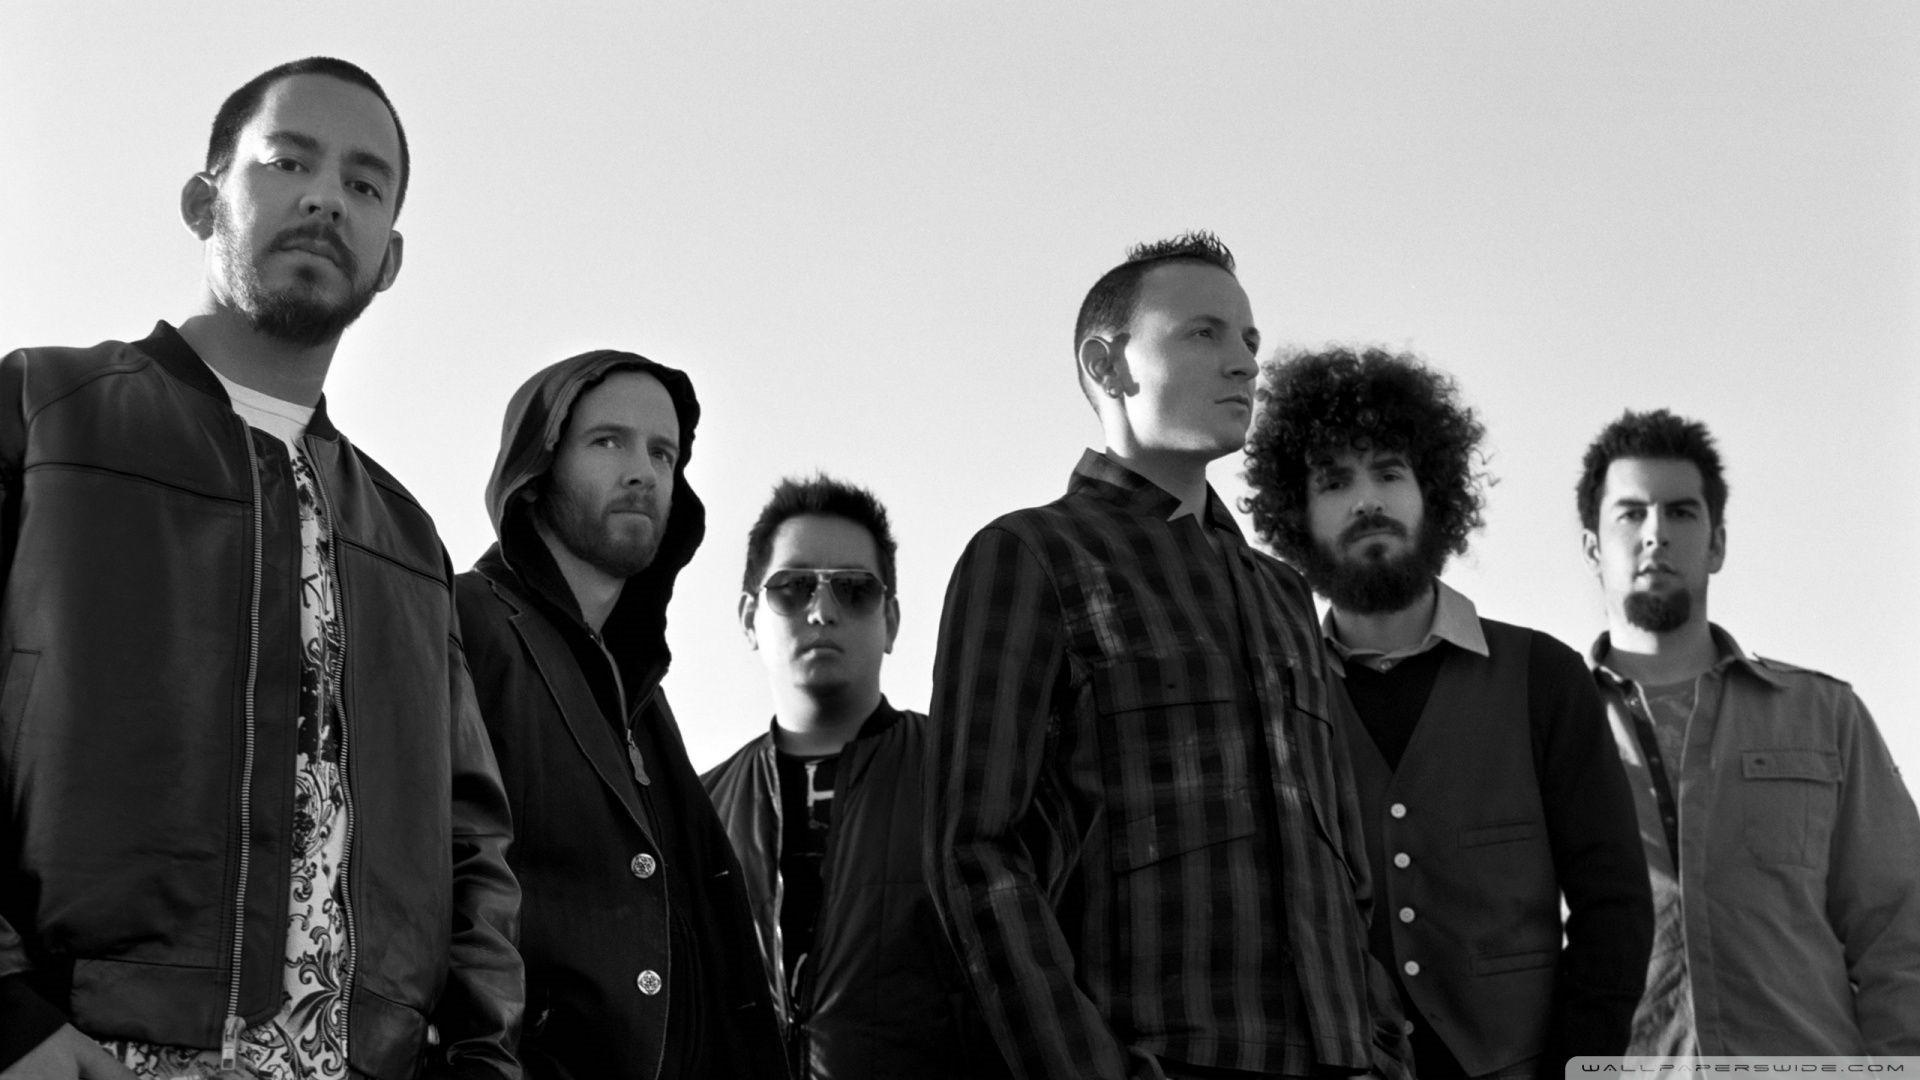 Linkin Park Wallpaper HD